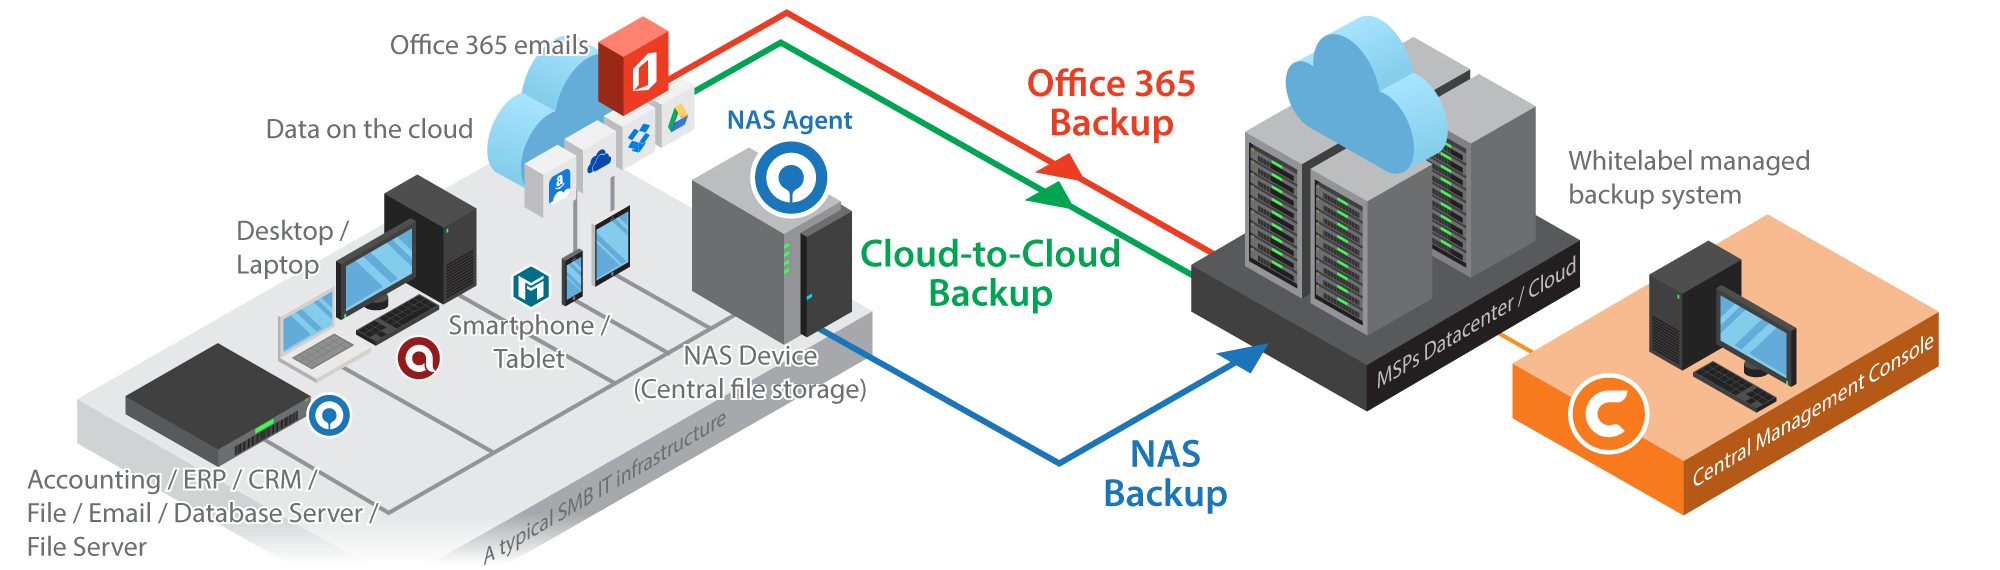 rebrandable cloud online managed backup software for msps ahsay